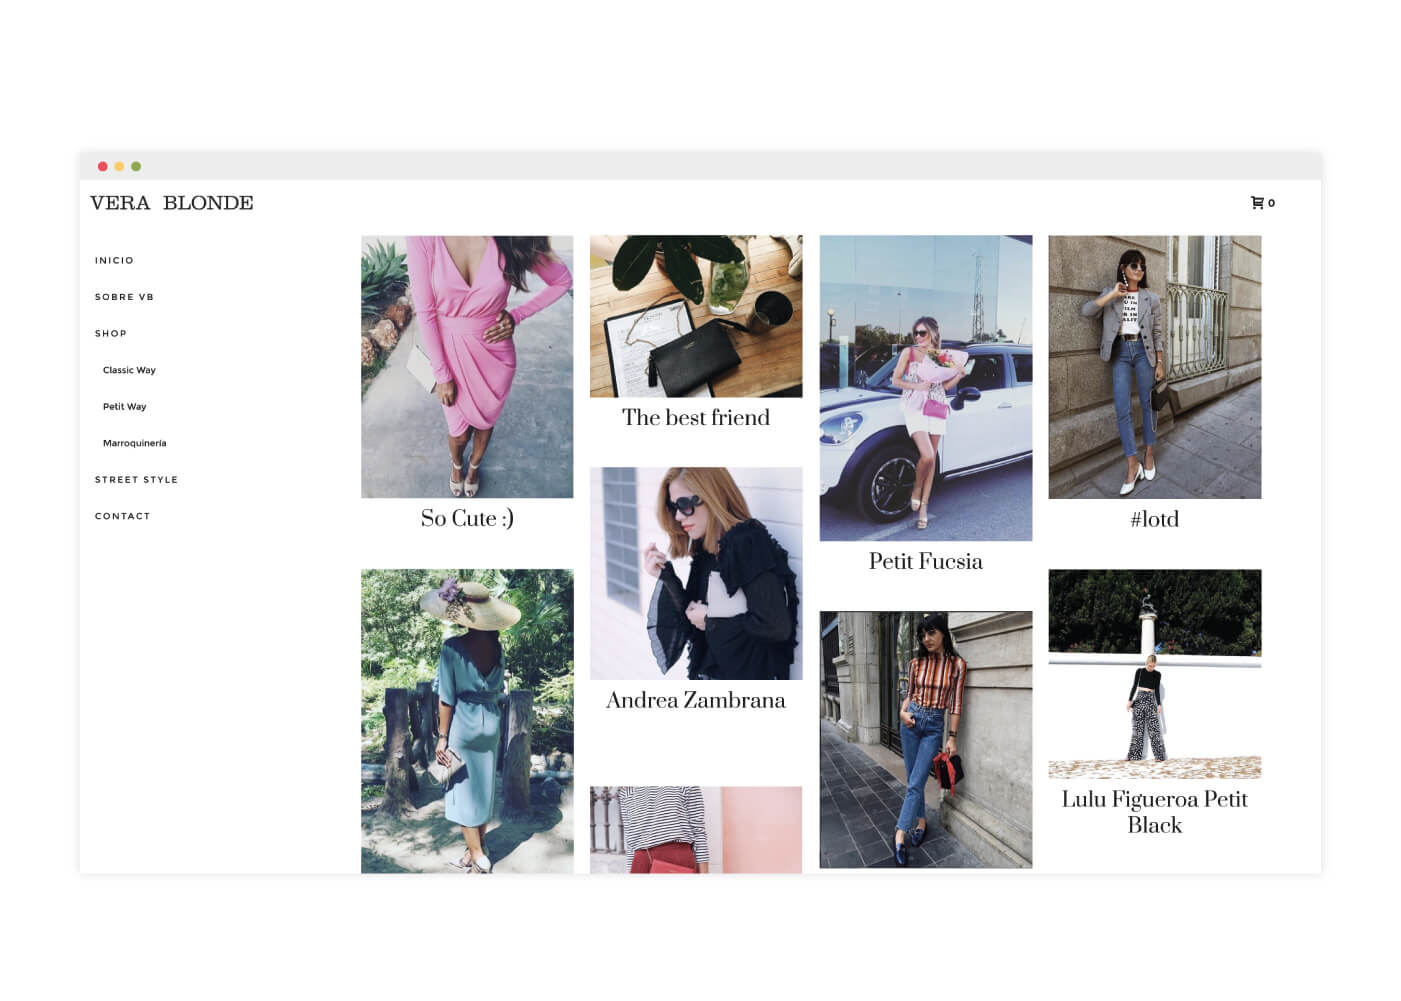 diseno-programacion-tienda-online-bolsos-vera-blonde-6